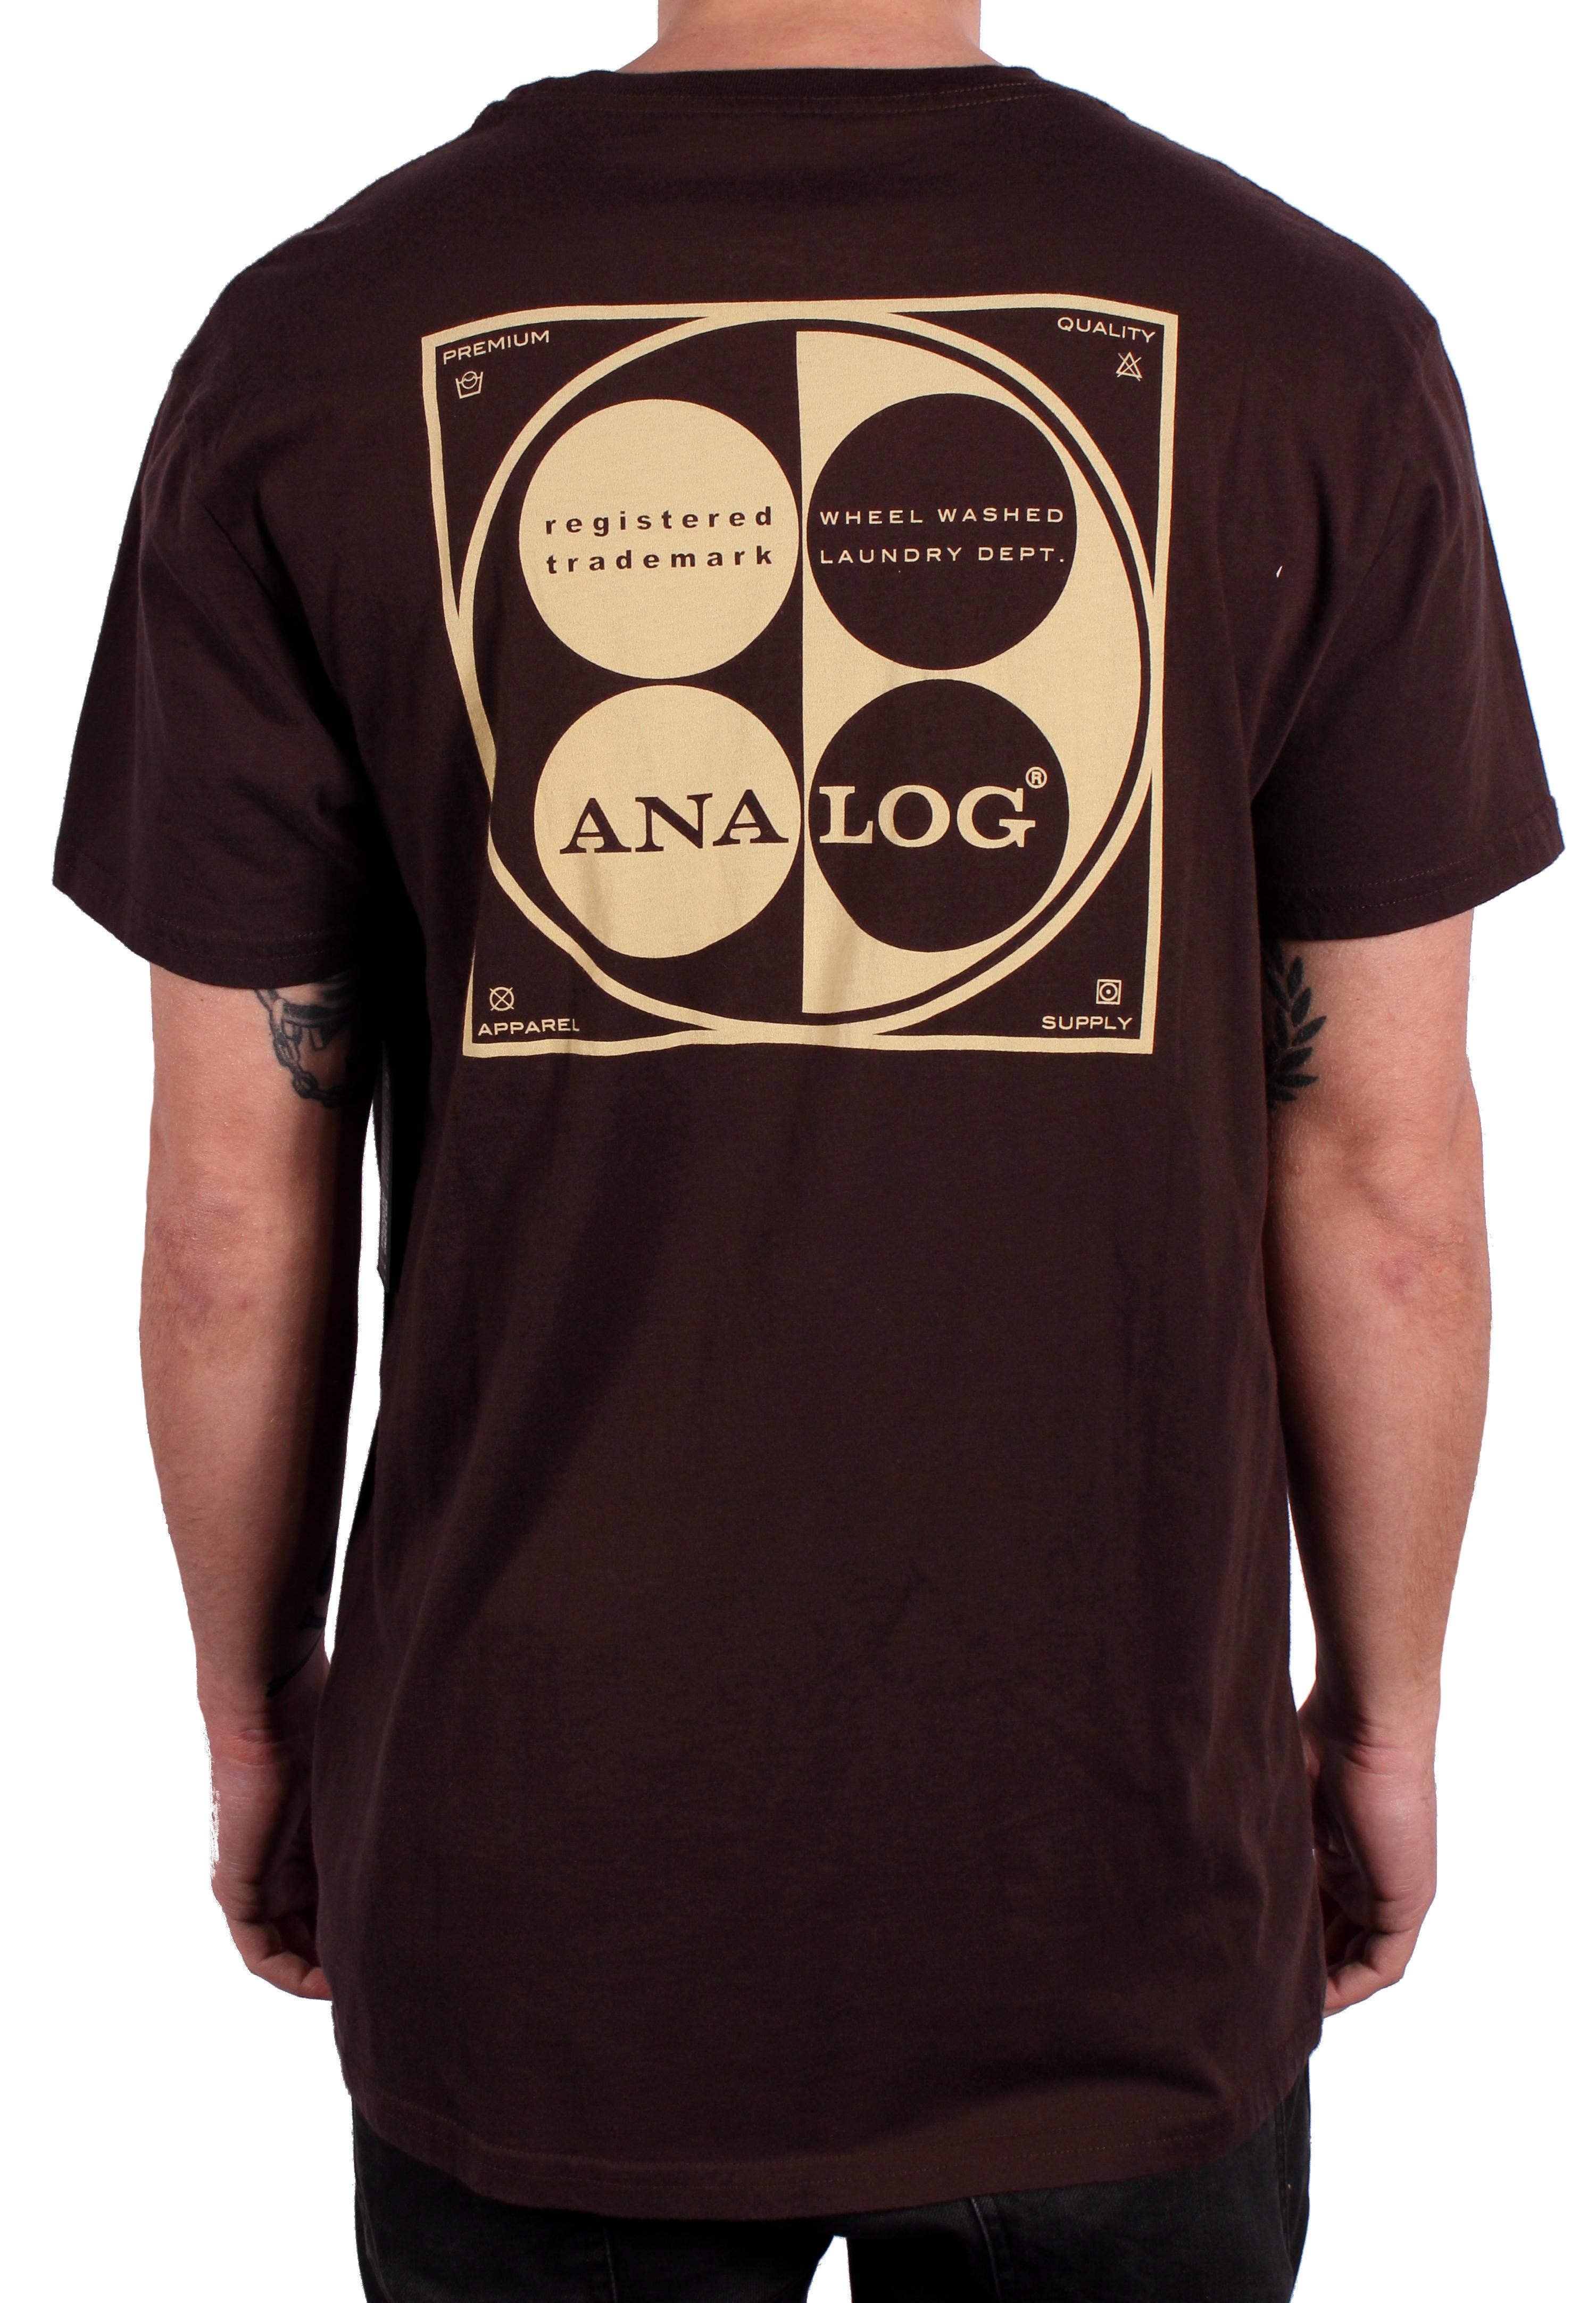 Koszulka Analog Laundromat Wwp (Coffee Bean)